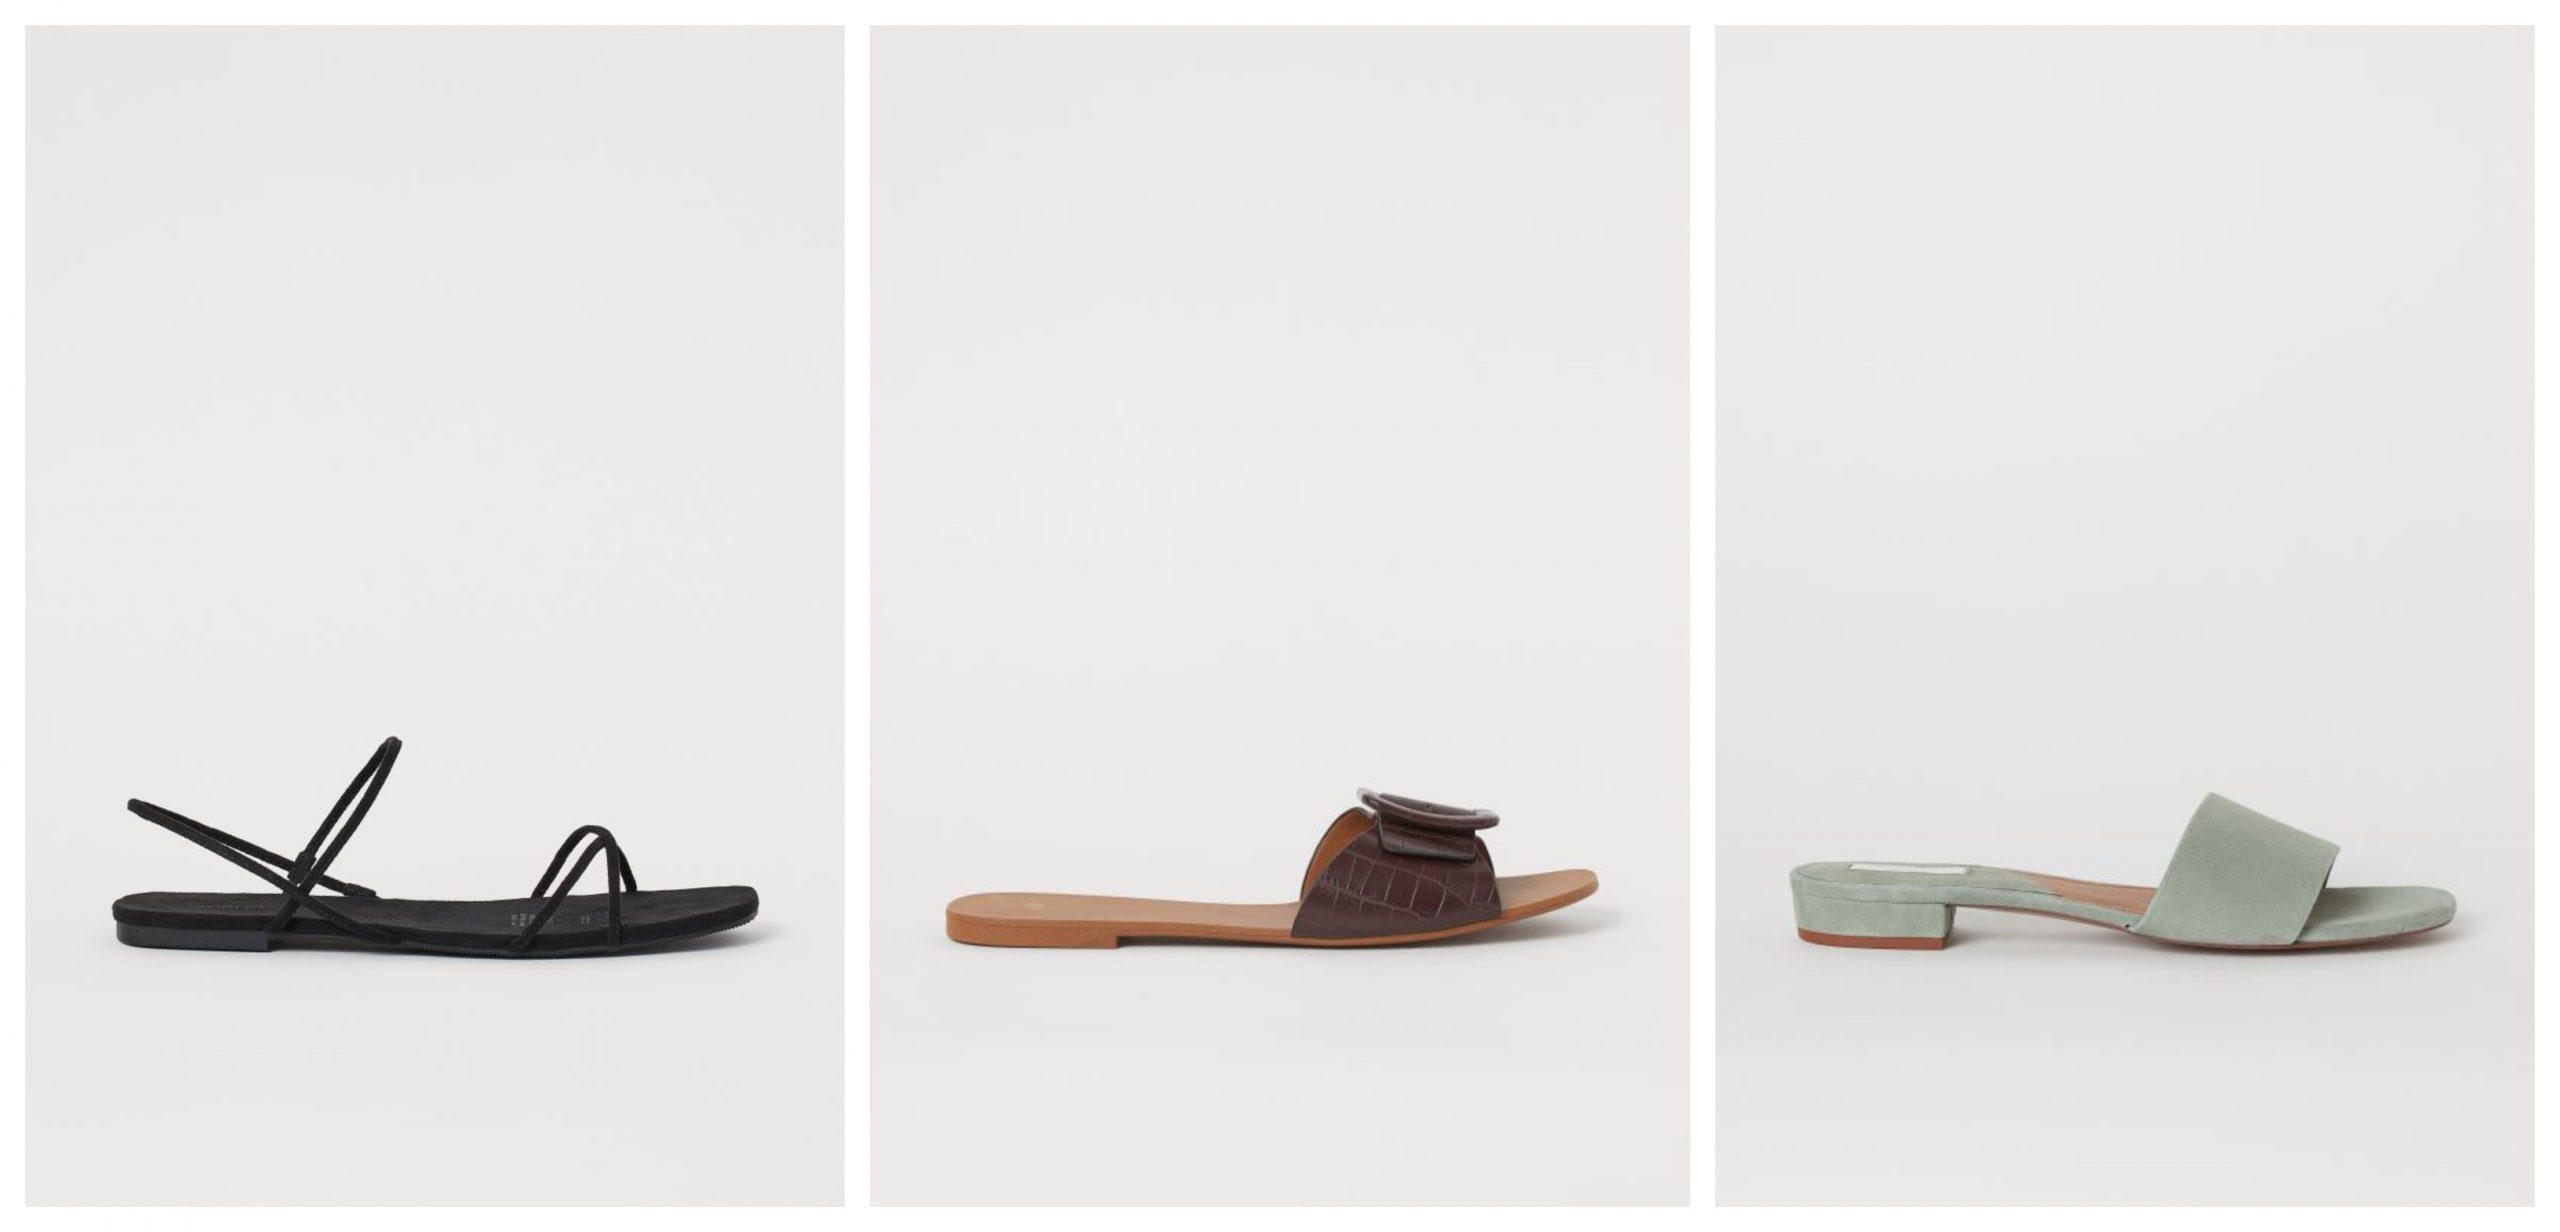 3 ideas de sandalias planas rebajadas de H&M para lucir este verano.